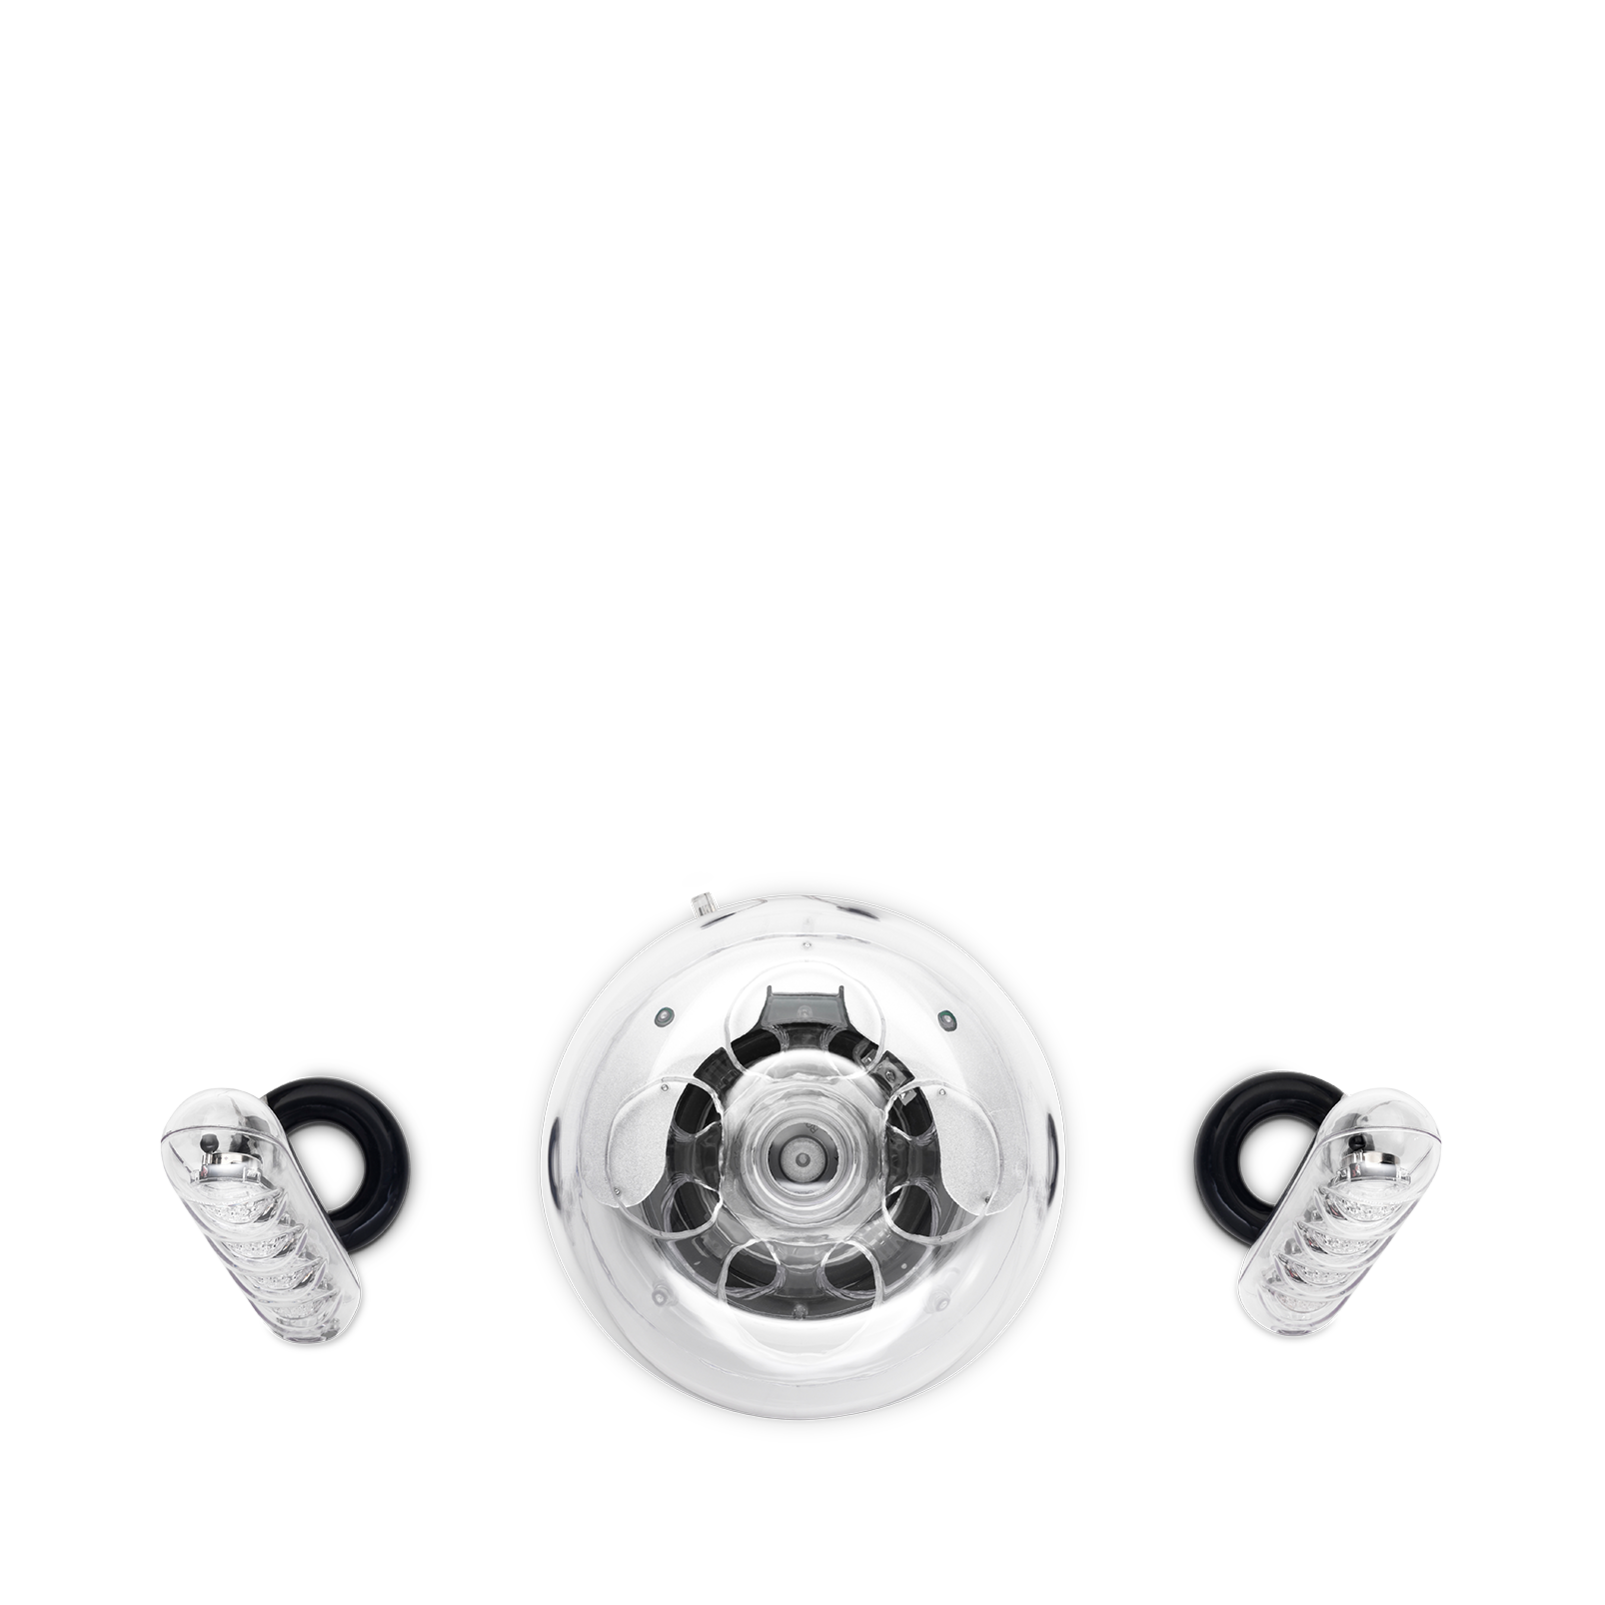 SoundSticks III - Clear - Three-piece, 2.1-channel multimedia sound system - Detailshot 3